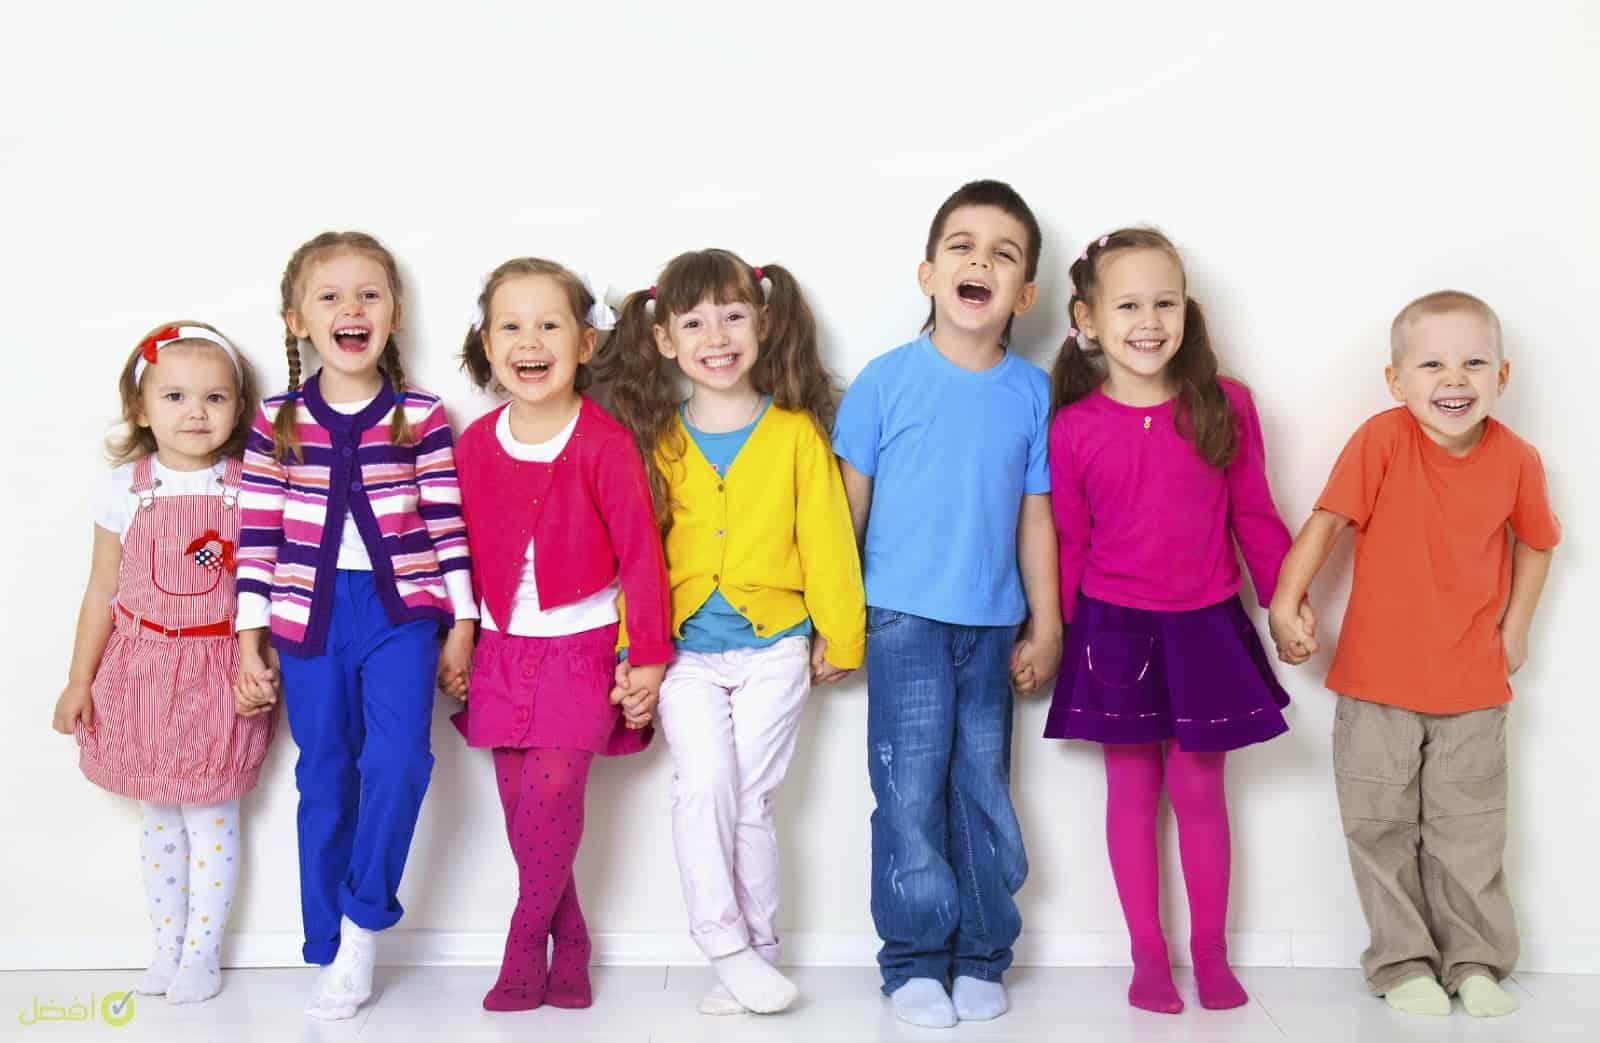 e8c5f97d1 افضل موقع لشراء ملابس الأطفال   افضل